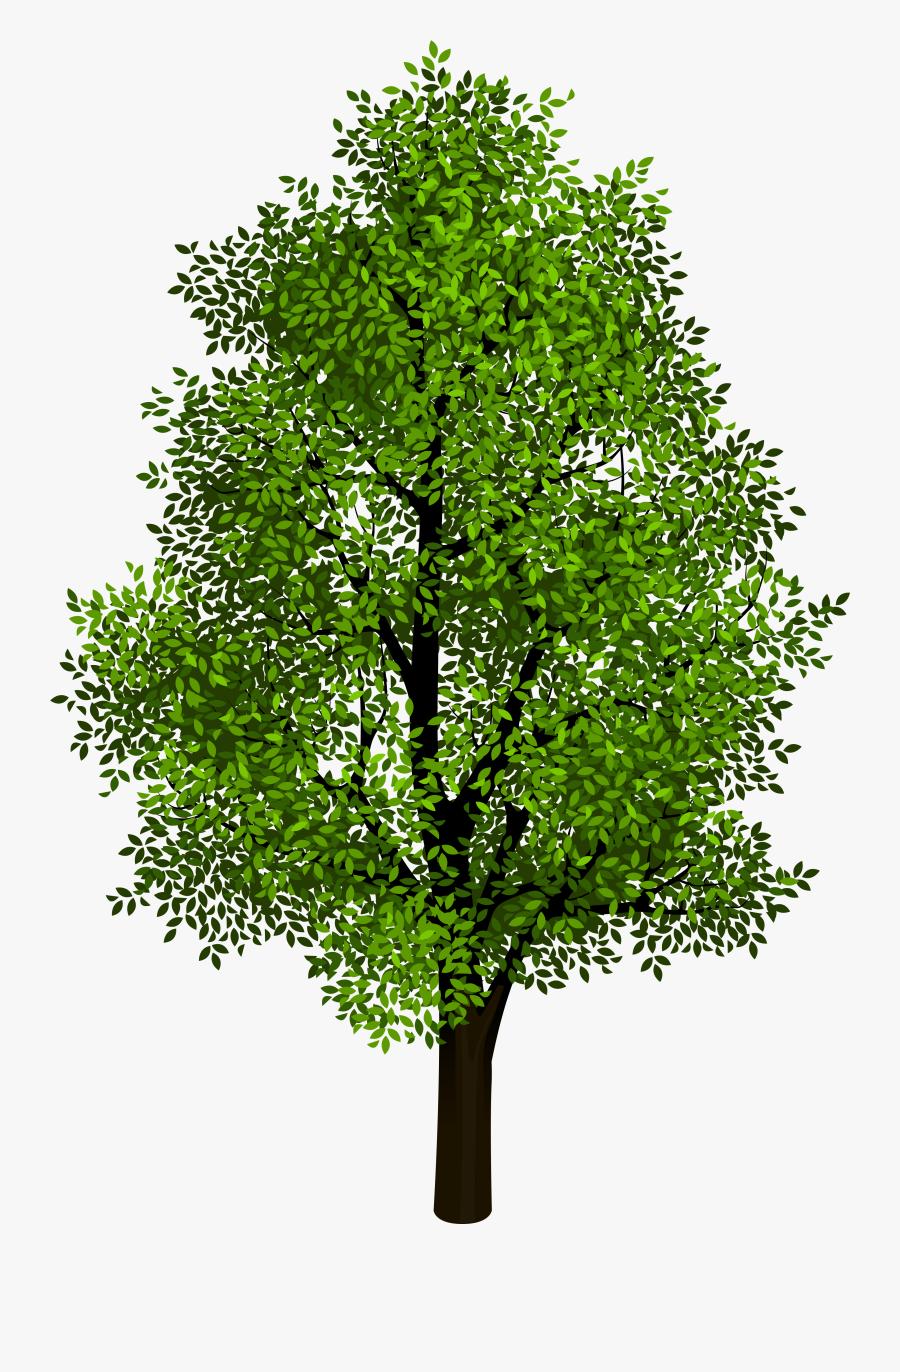 Transparent Airplane Clipart No Background - Tree Without A Background, Transparent Clipart